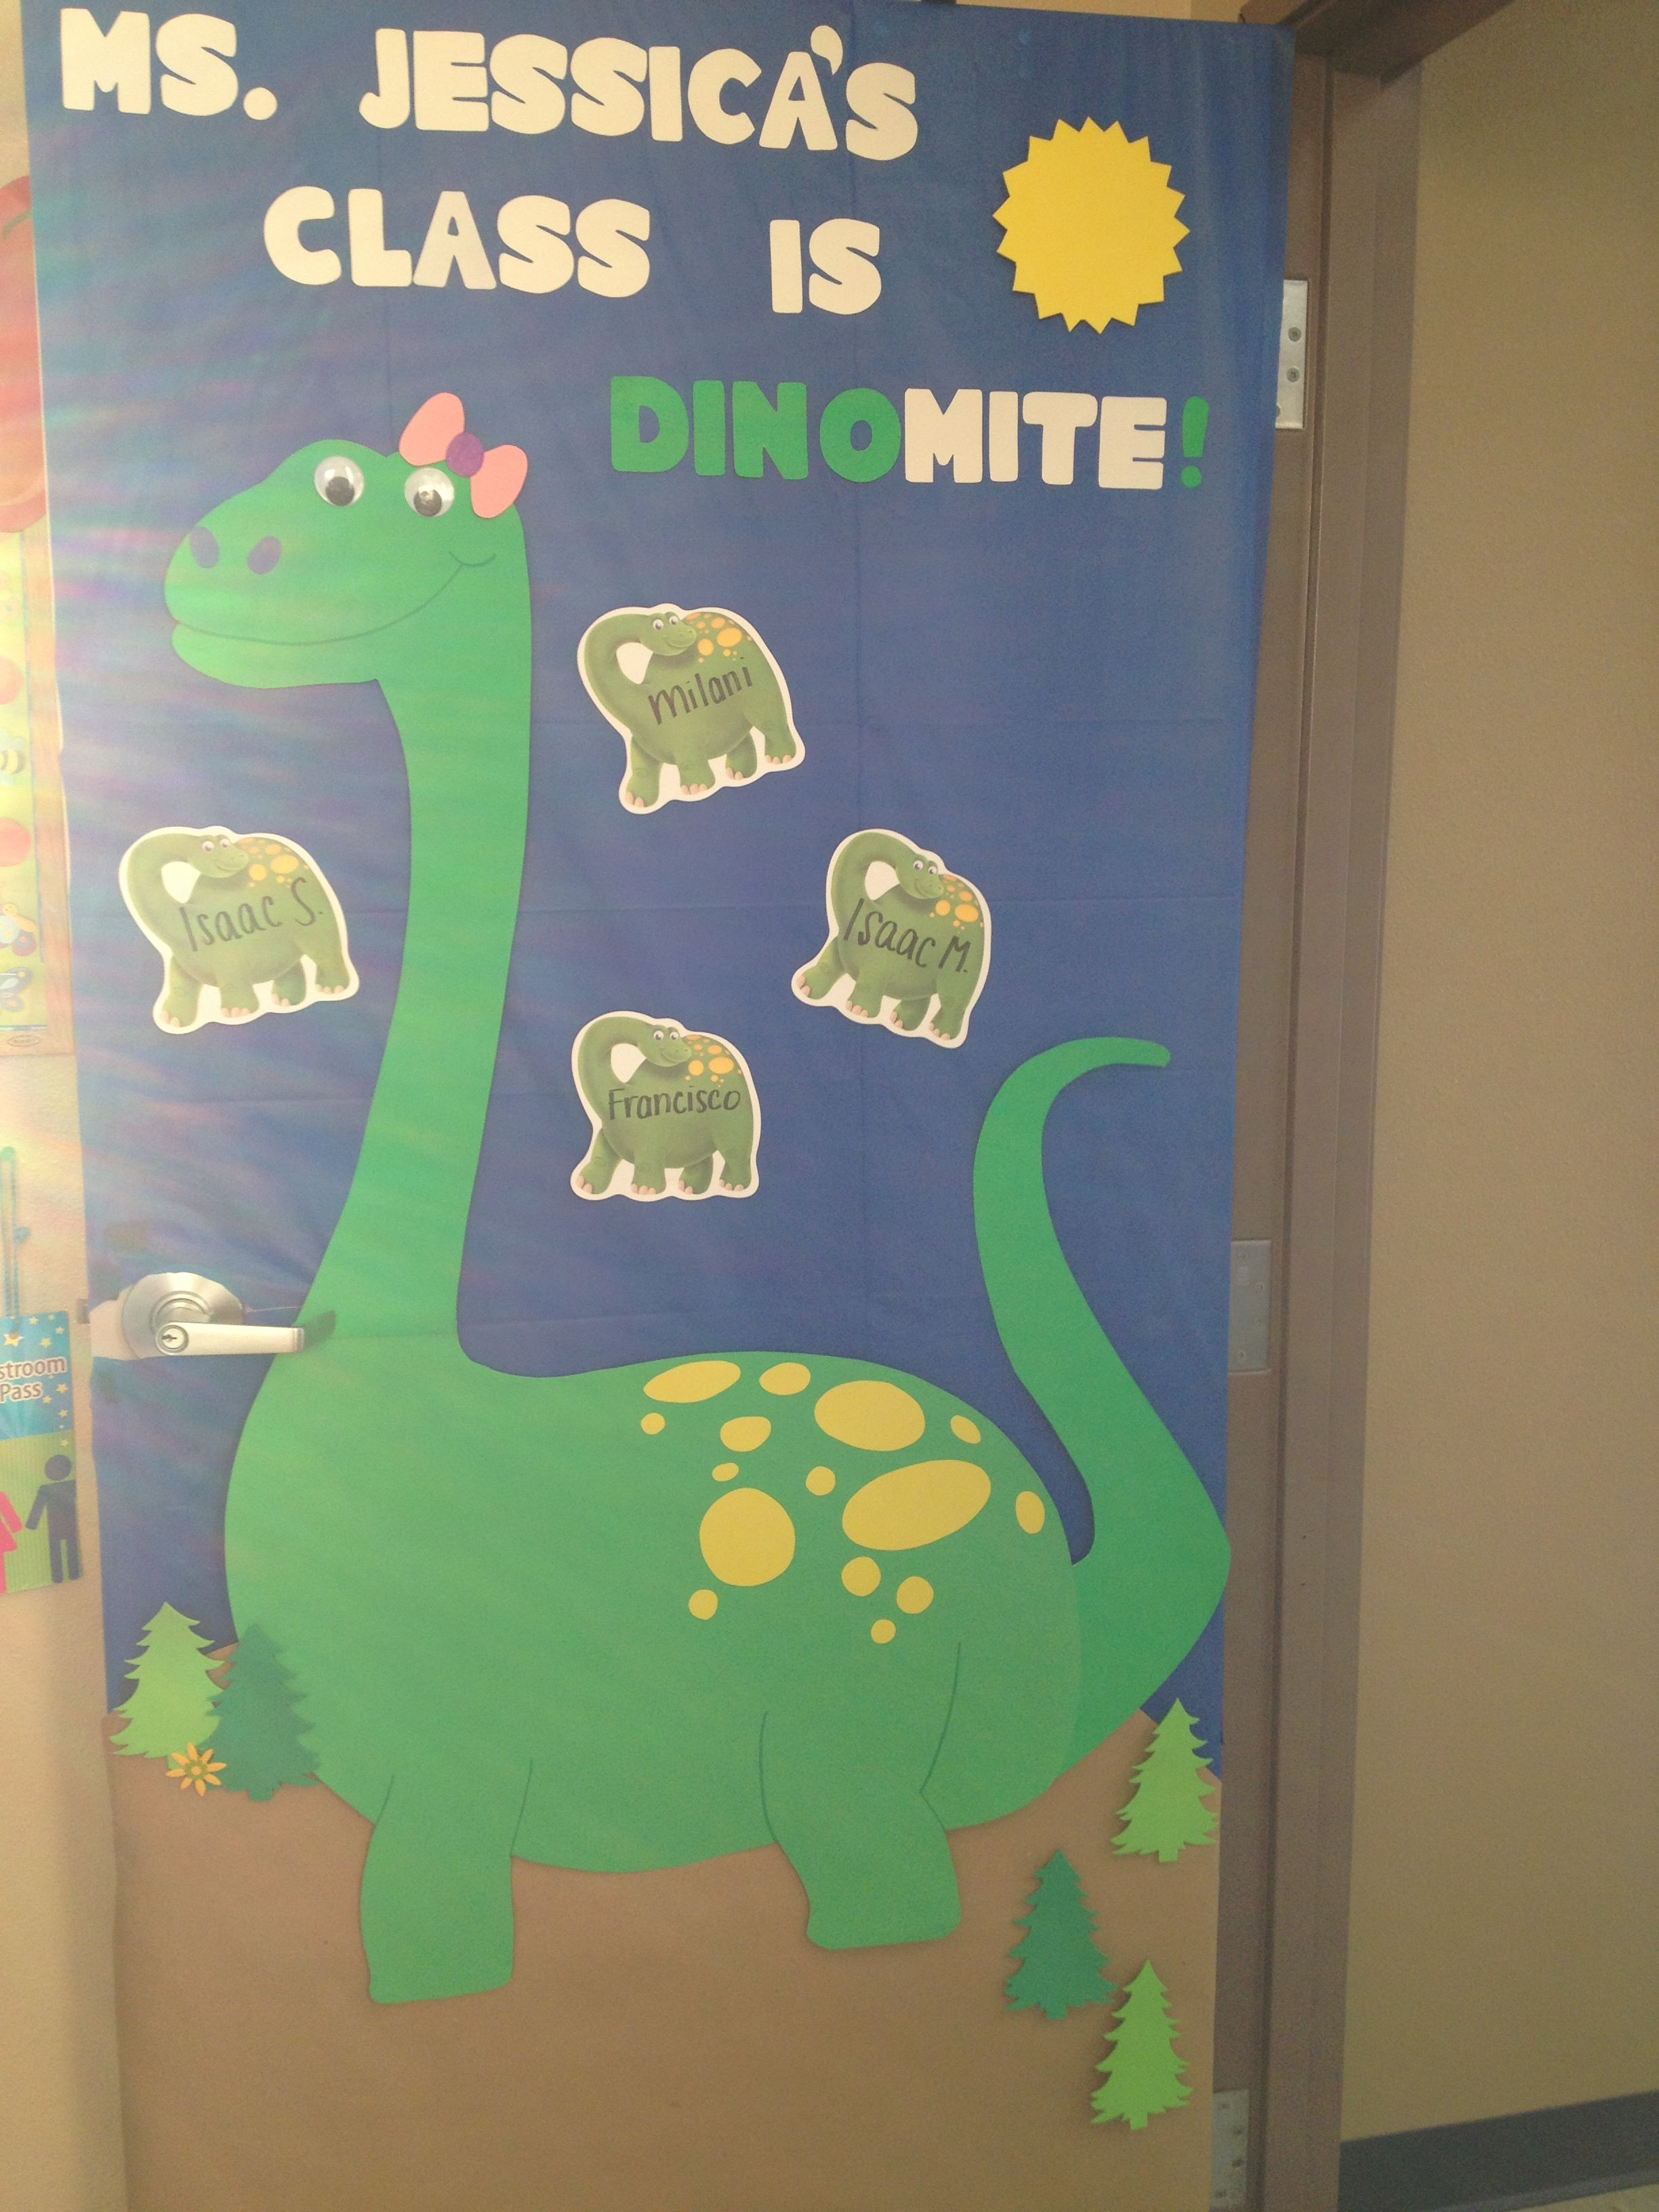 60 Dinosaur brontosaurus 4x green card confetti Handmade party table decorations